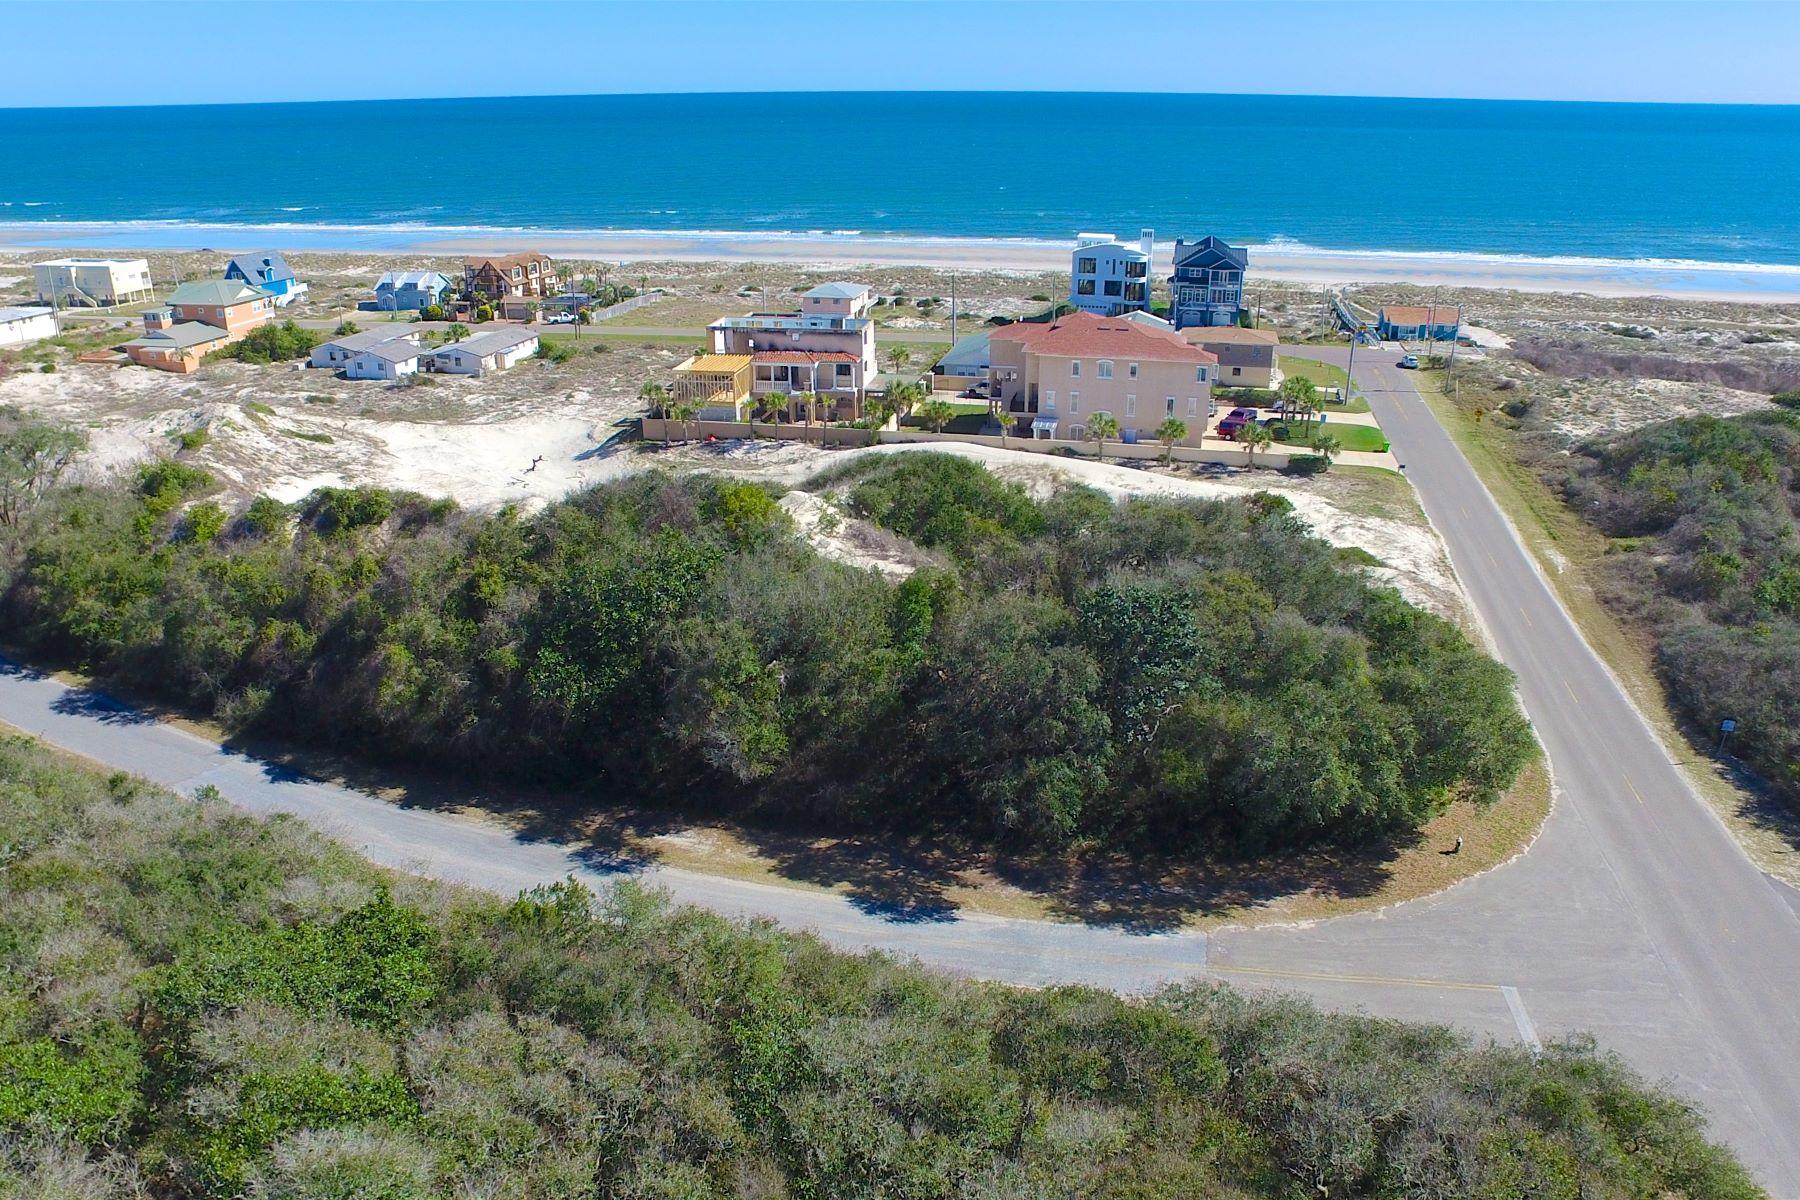 Land for Sale at Lots 4, 5 & 6 Ocean Blvd Lots 4,5 & 6 Ocean Boulevard, Amelia Island, Florida 32034 United States